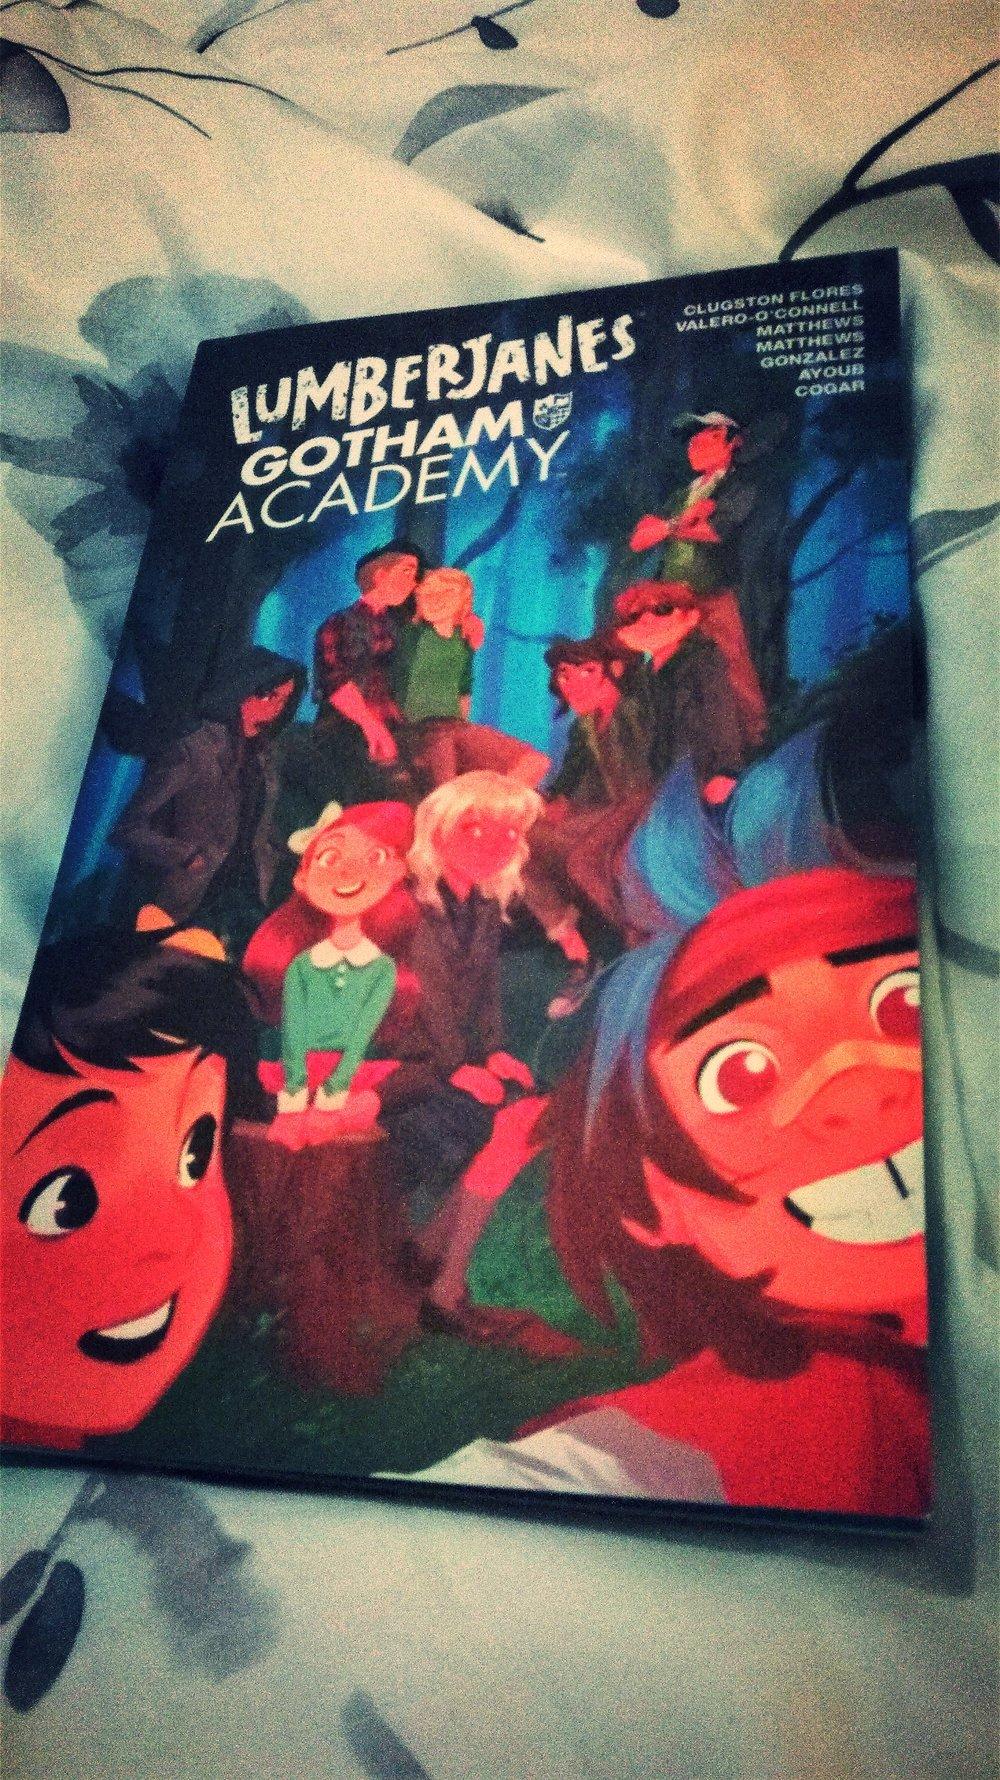 Lumberjanes/ Gotham Academy